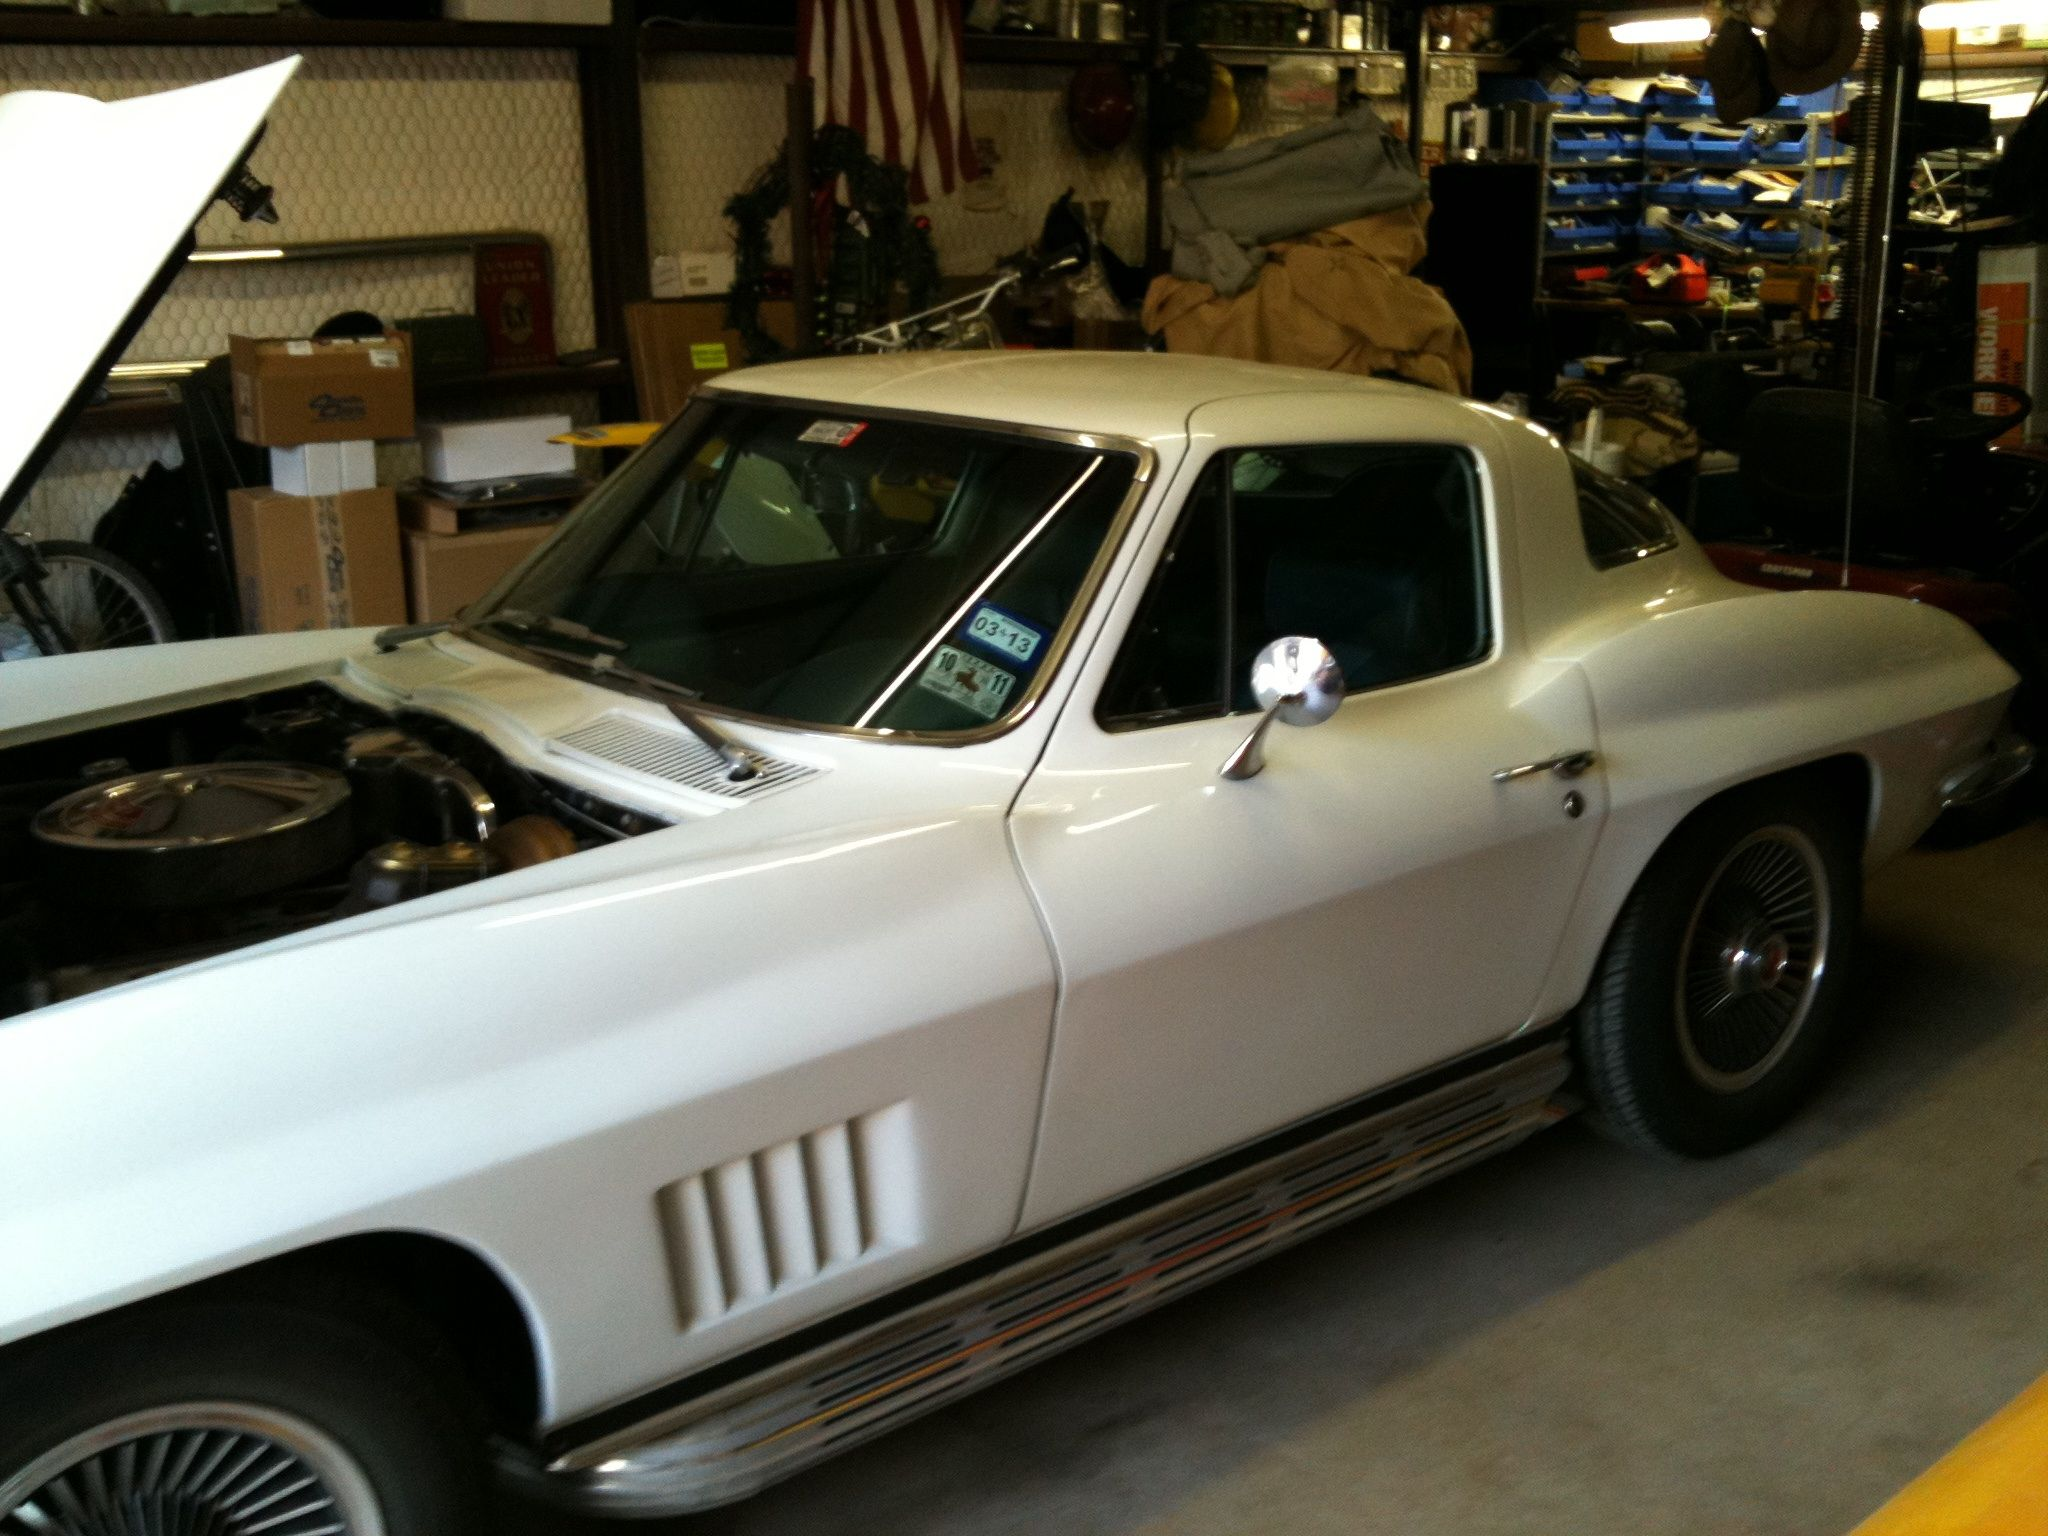 Craigslist 63 corvette split window autos post for Corvette split window 63